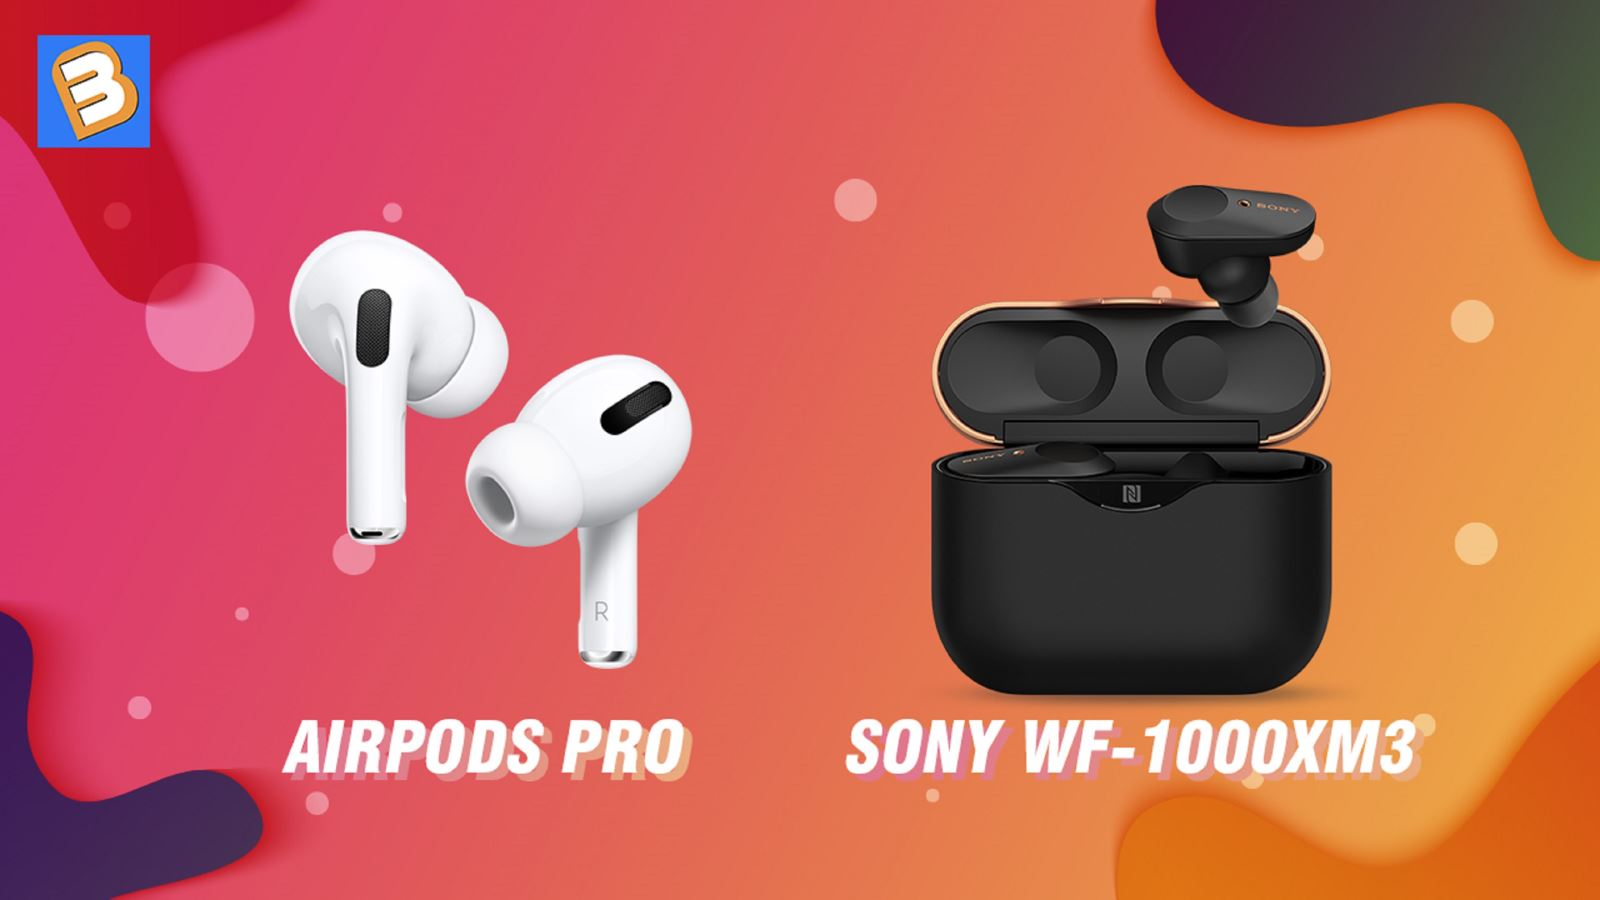 Chọn mua Airpods Pro hay Sony WF-1000XM3